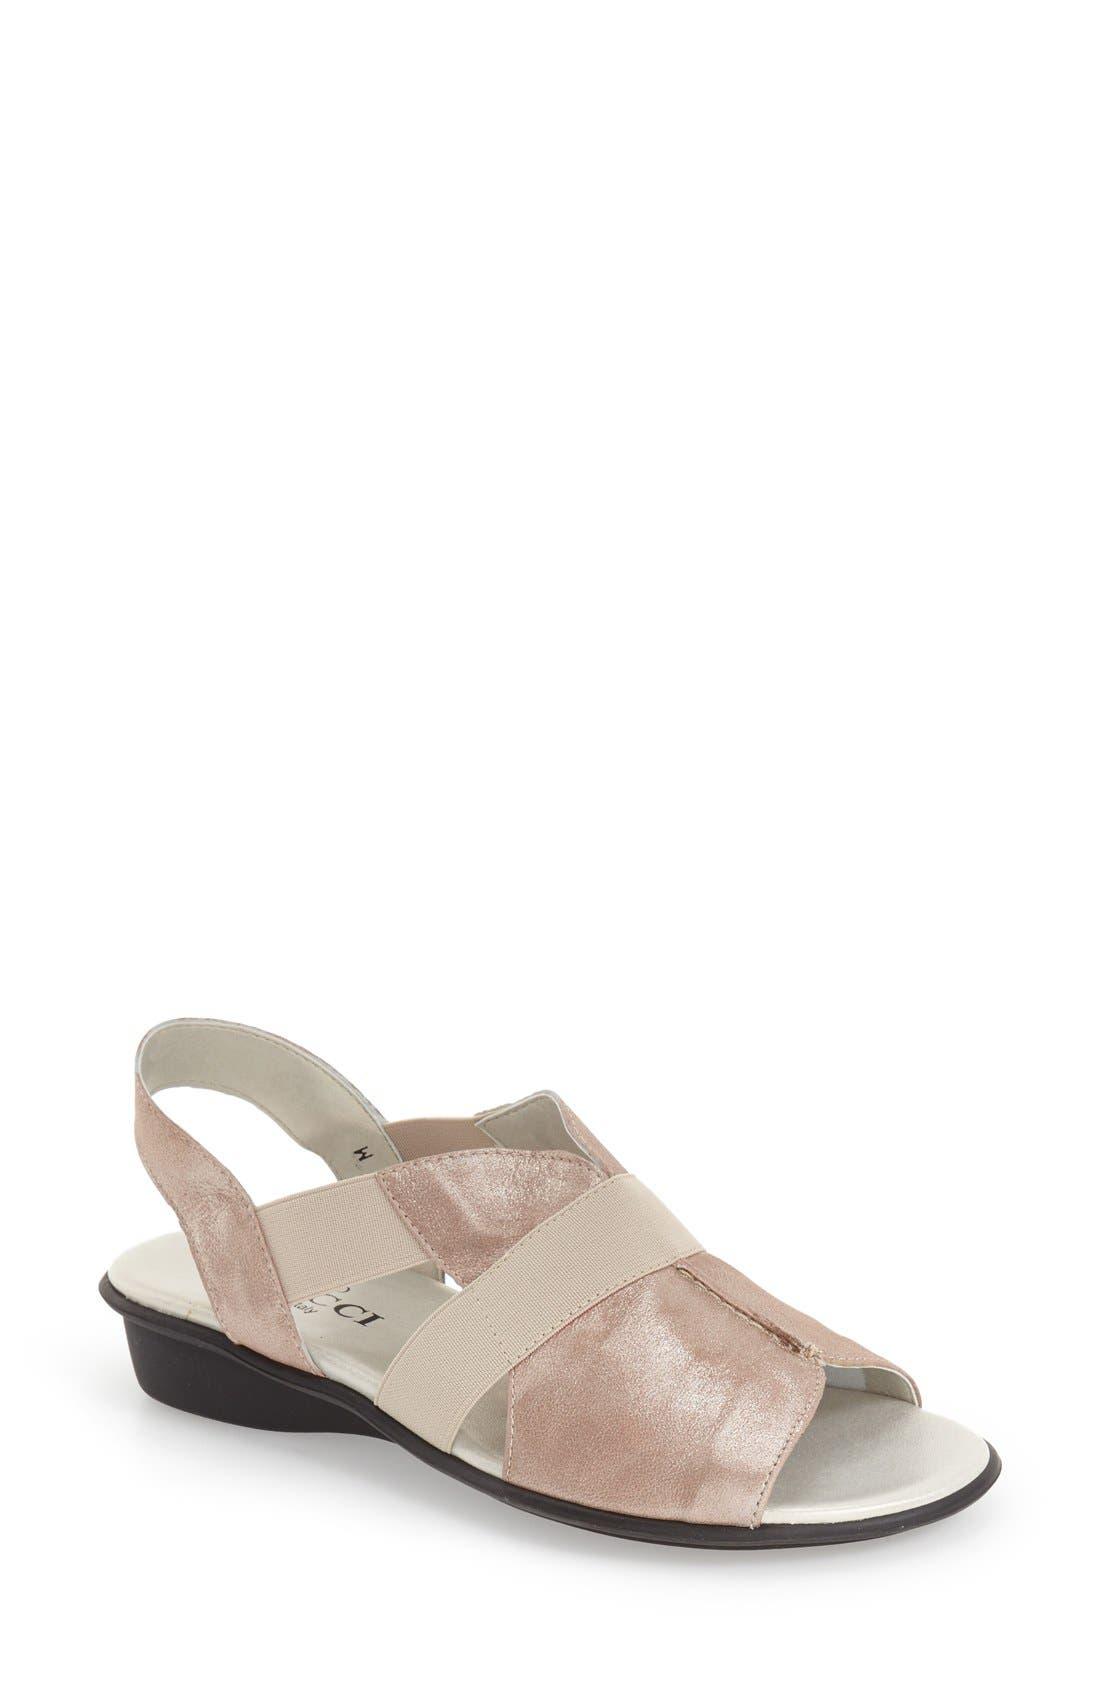 'Ella' Wedge Sandal,                         Main,                         color, SAND NUBUCK